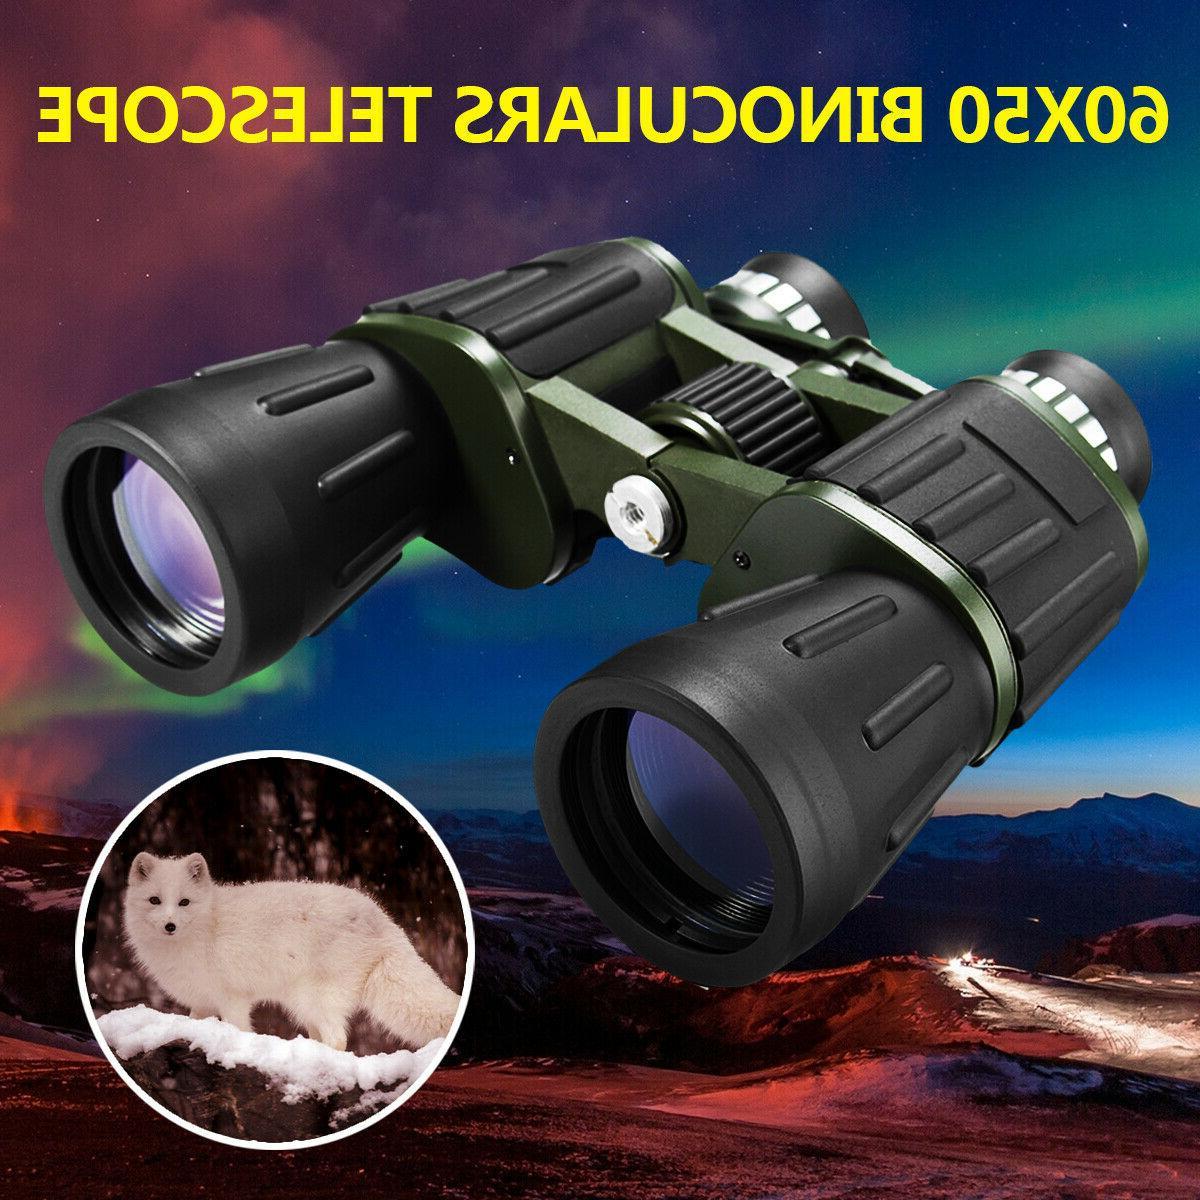 Portable Night HD Binoculars Hunting Camping Telescope +